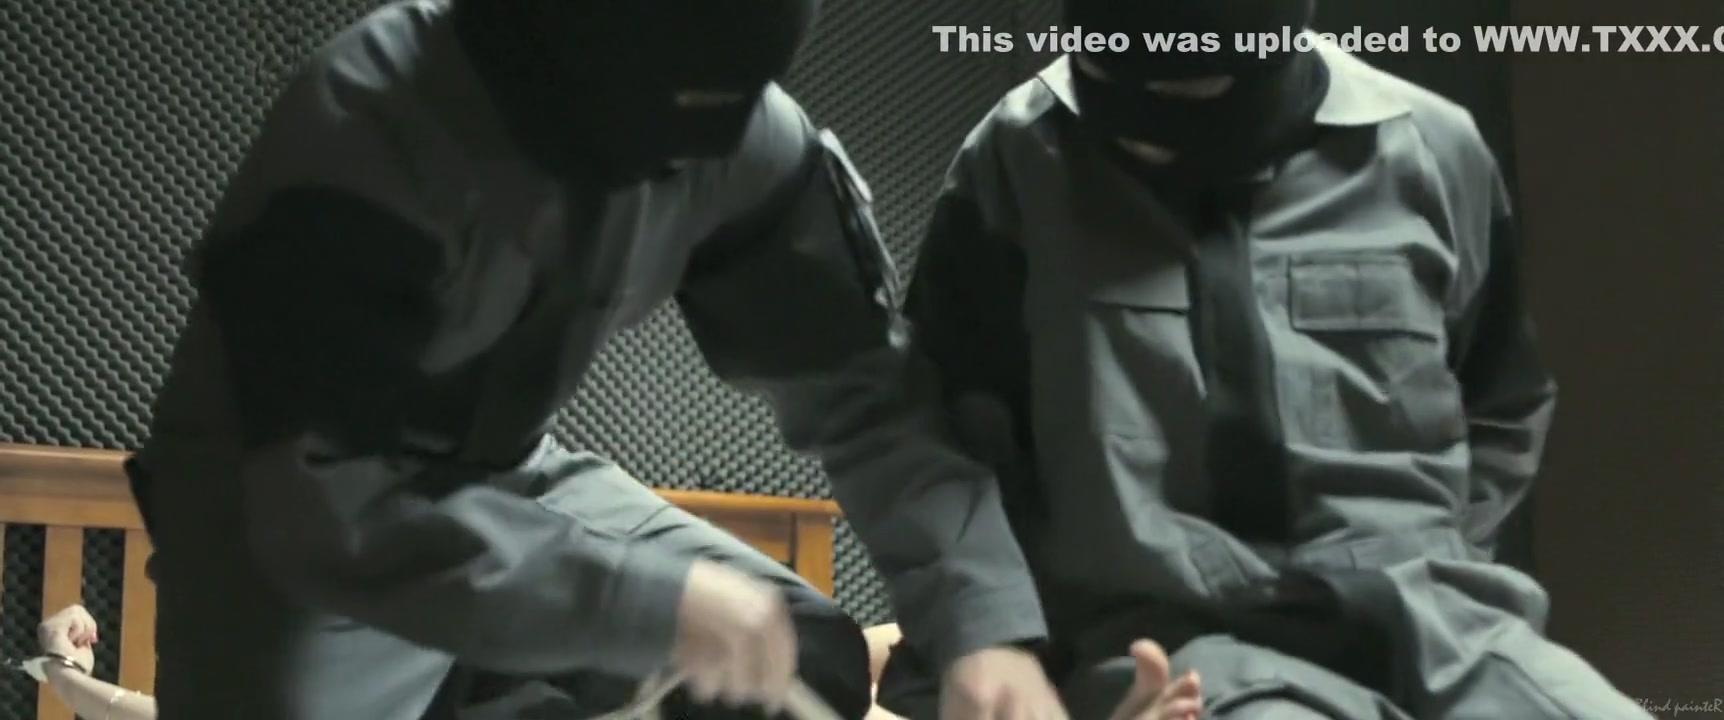 Good Video 18+ Interesting wedding rings